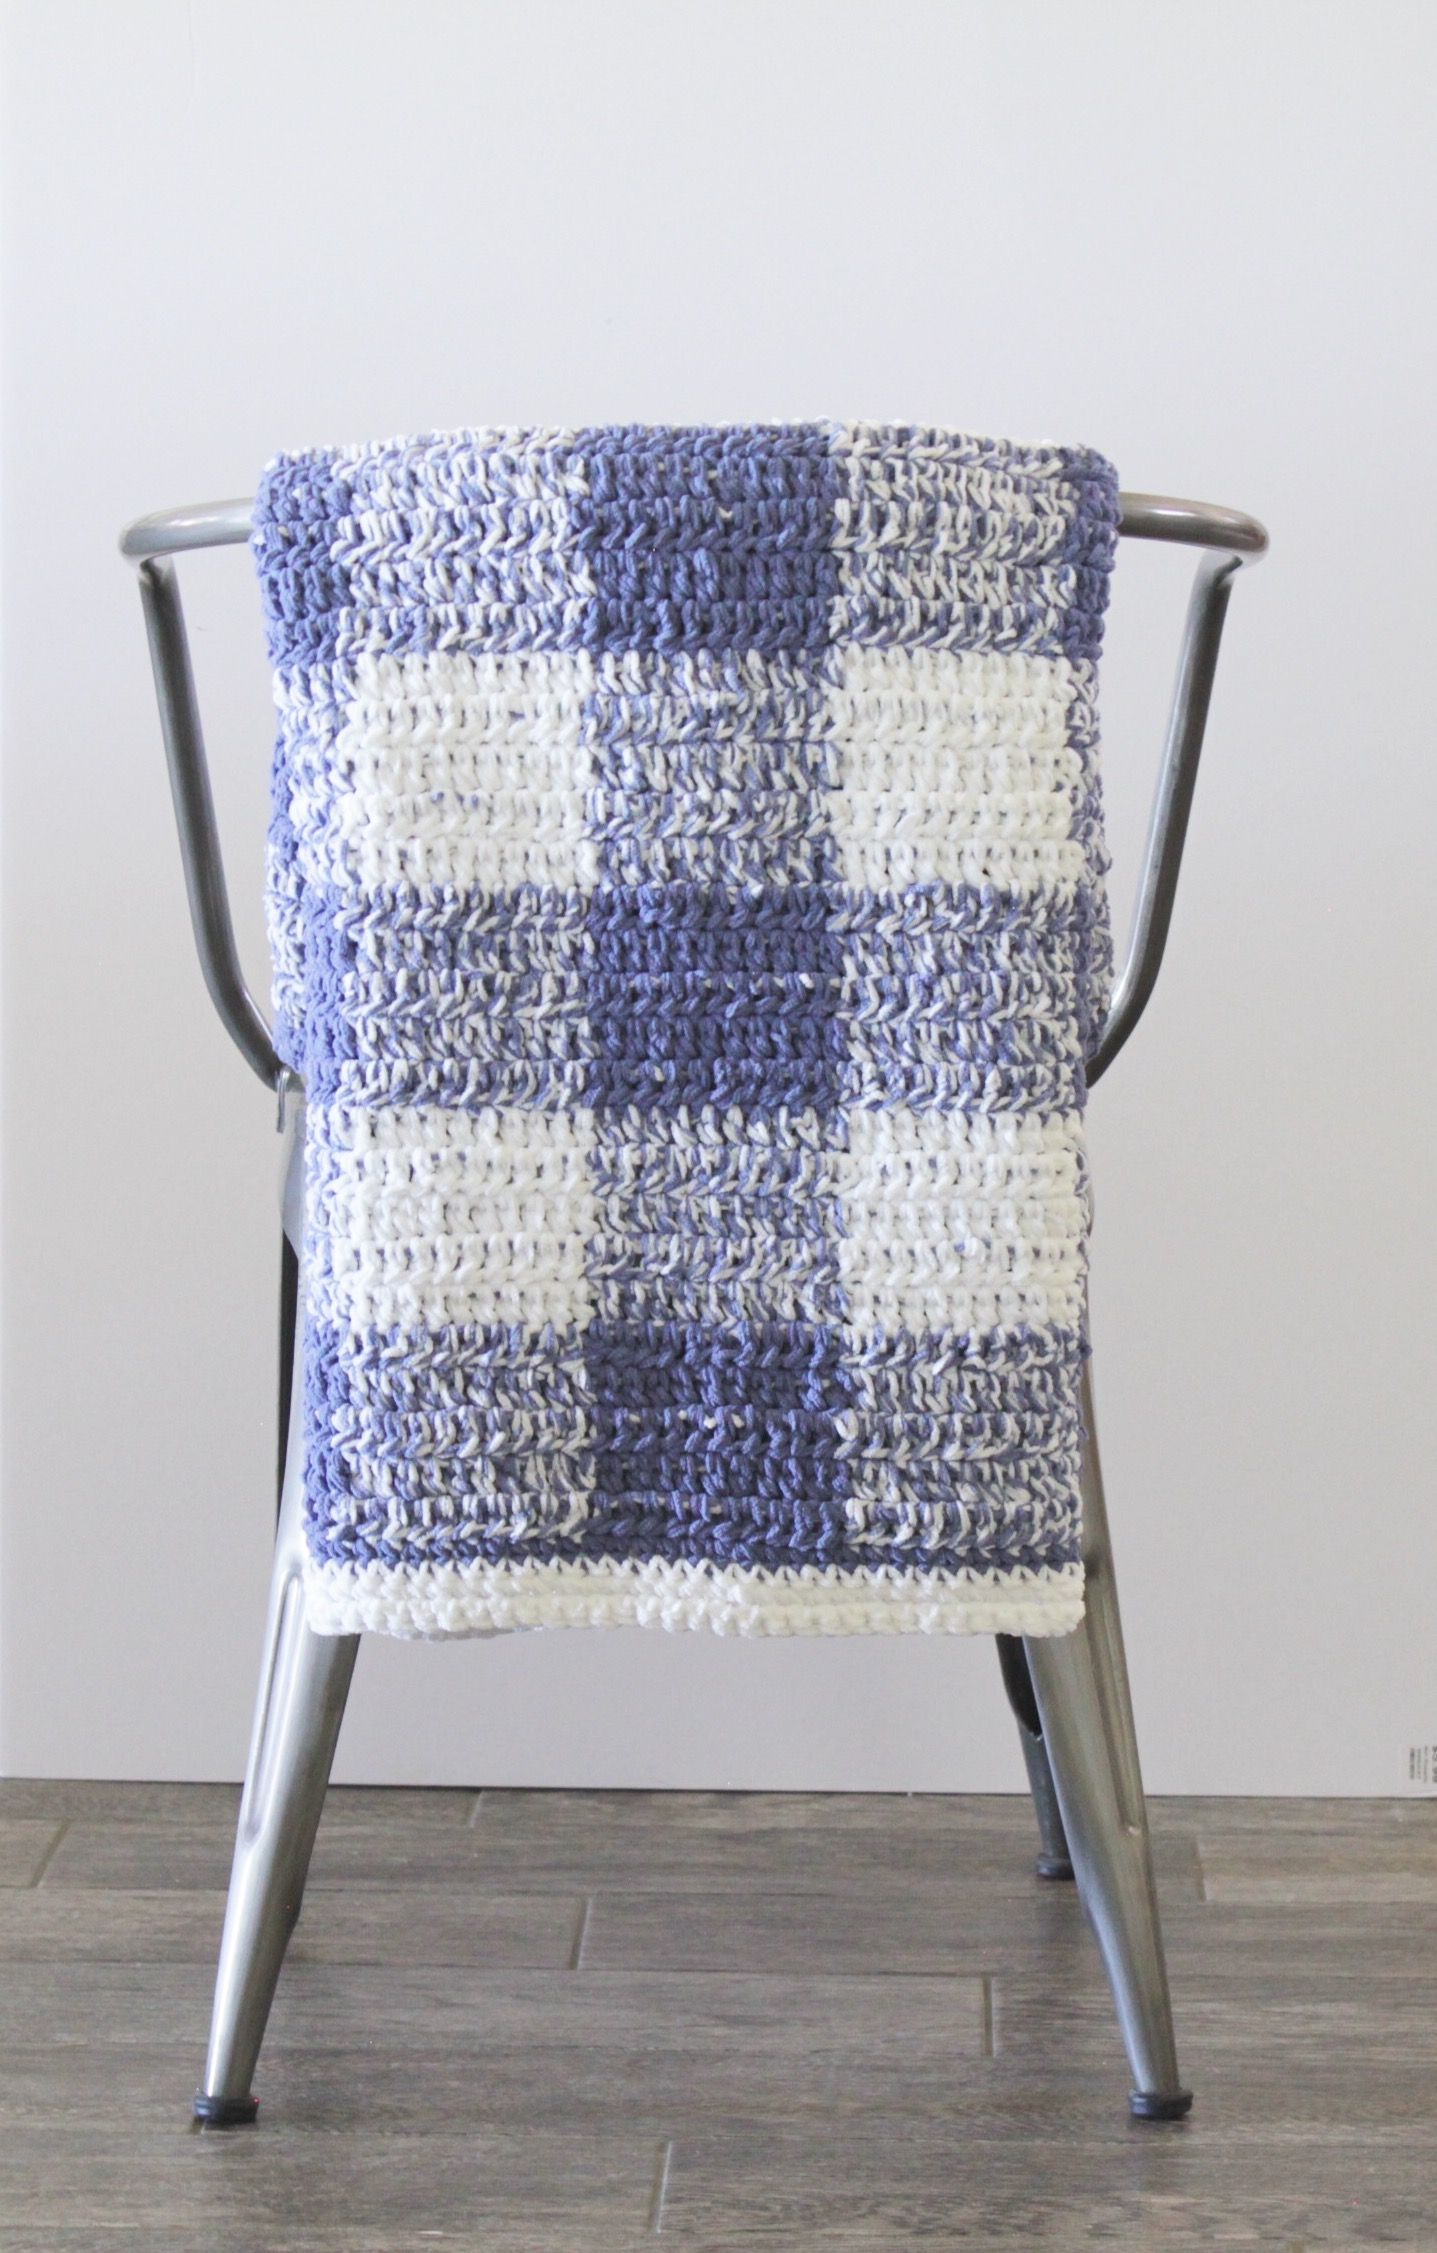 Blue Gingham Crochet Blanket - Free Pattern from Daisy Farm Crafts ...